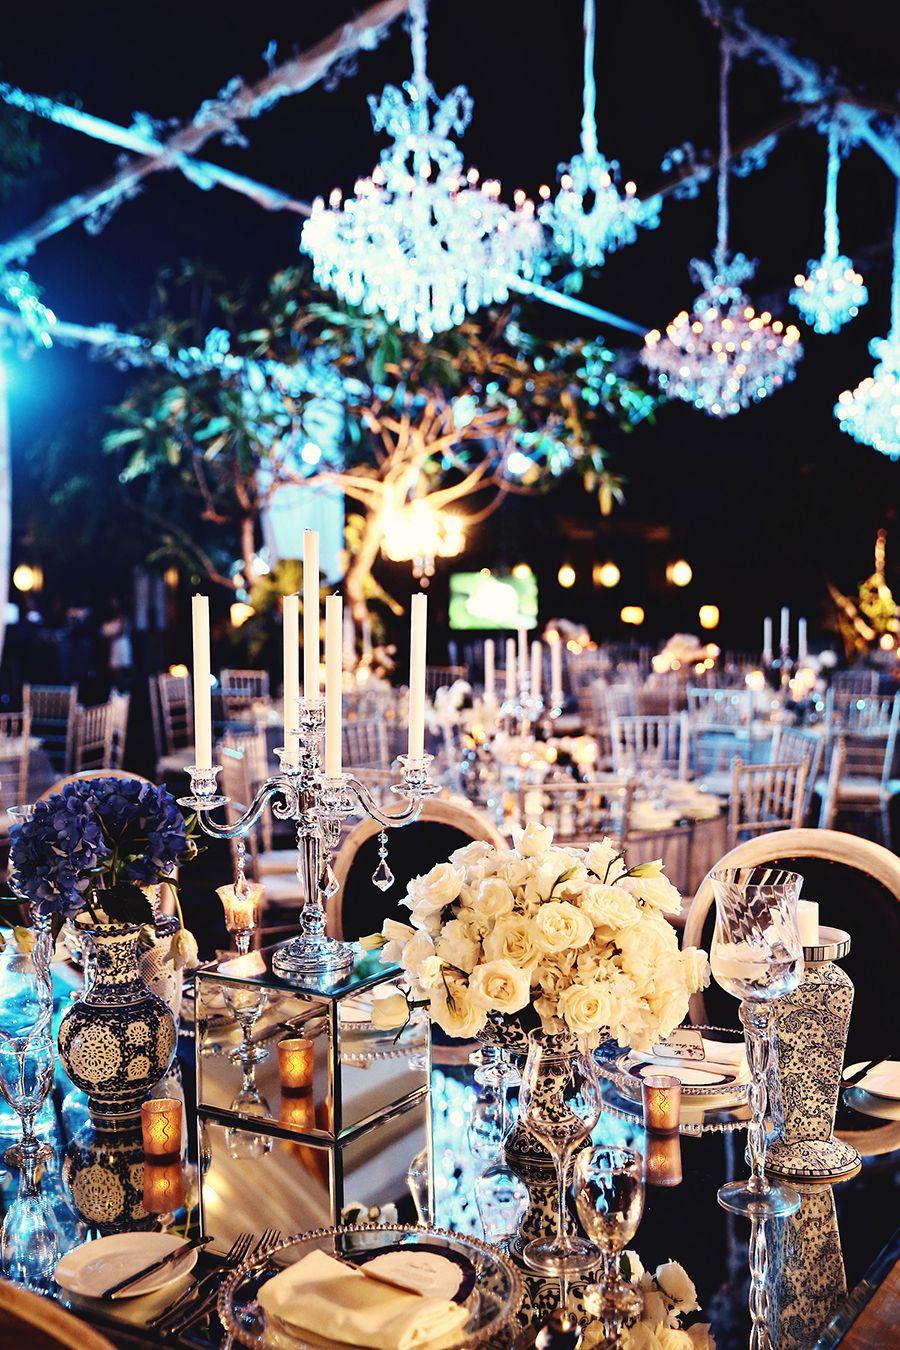 Wilis and etikas chinoiserie infused with rococo bali wedding chinoiserie wedding table decor wilis and etikas chinoiserie infused with rococo bali junglespirit Choice Image